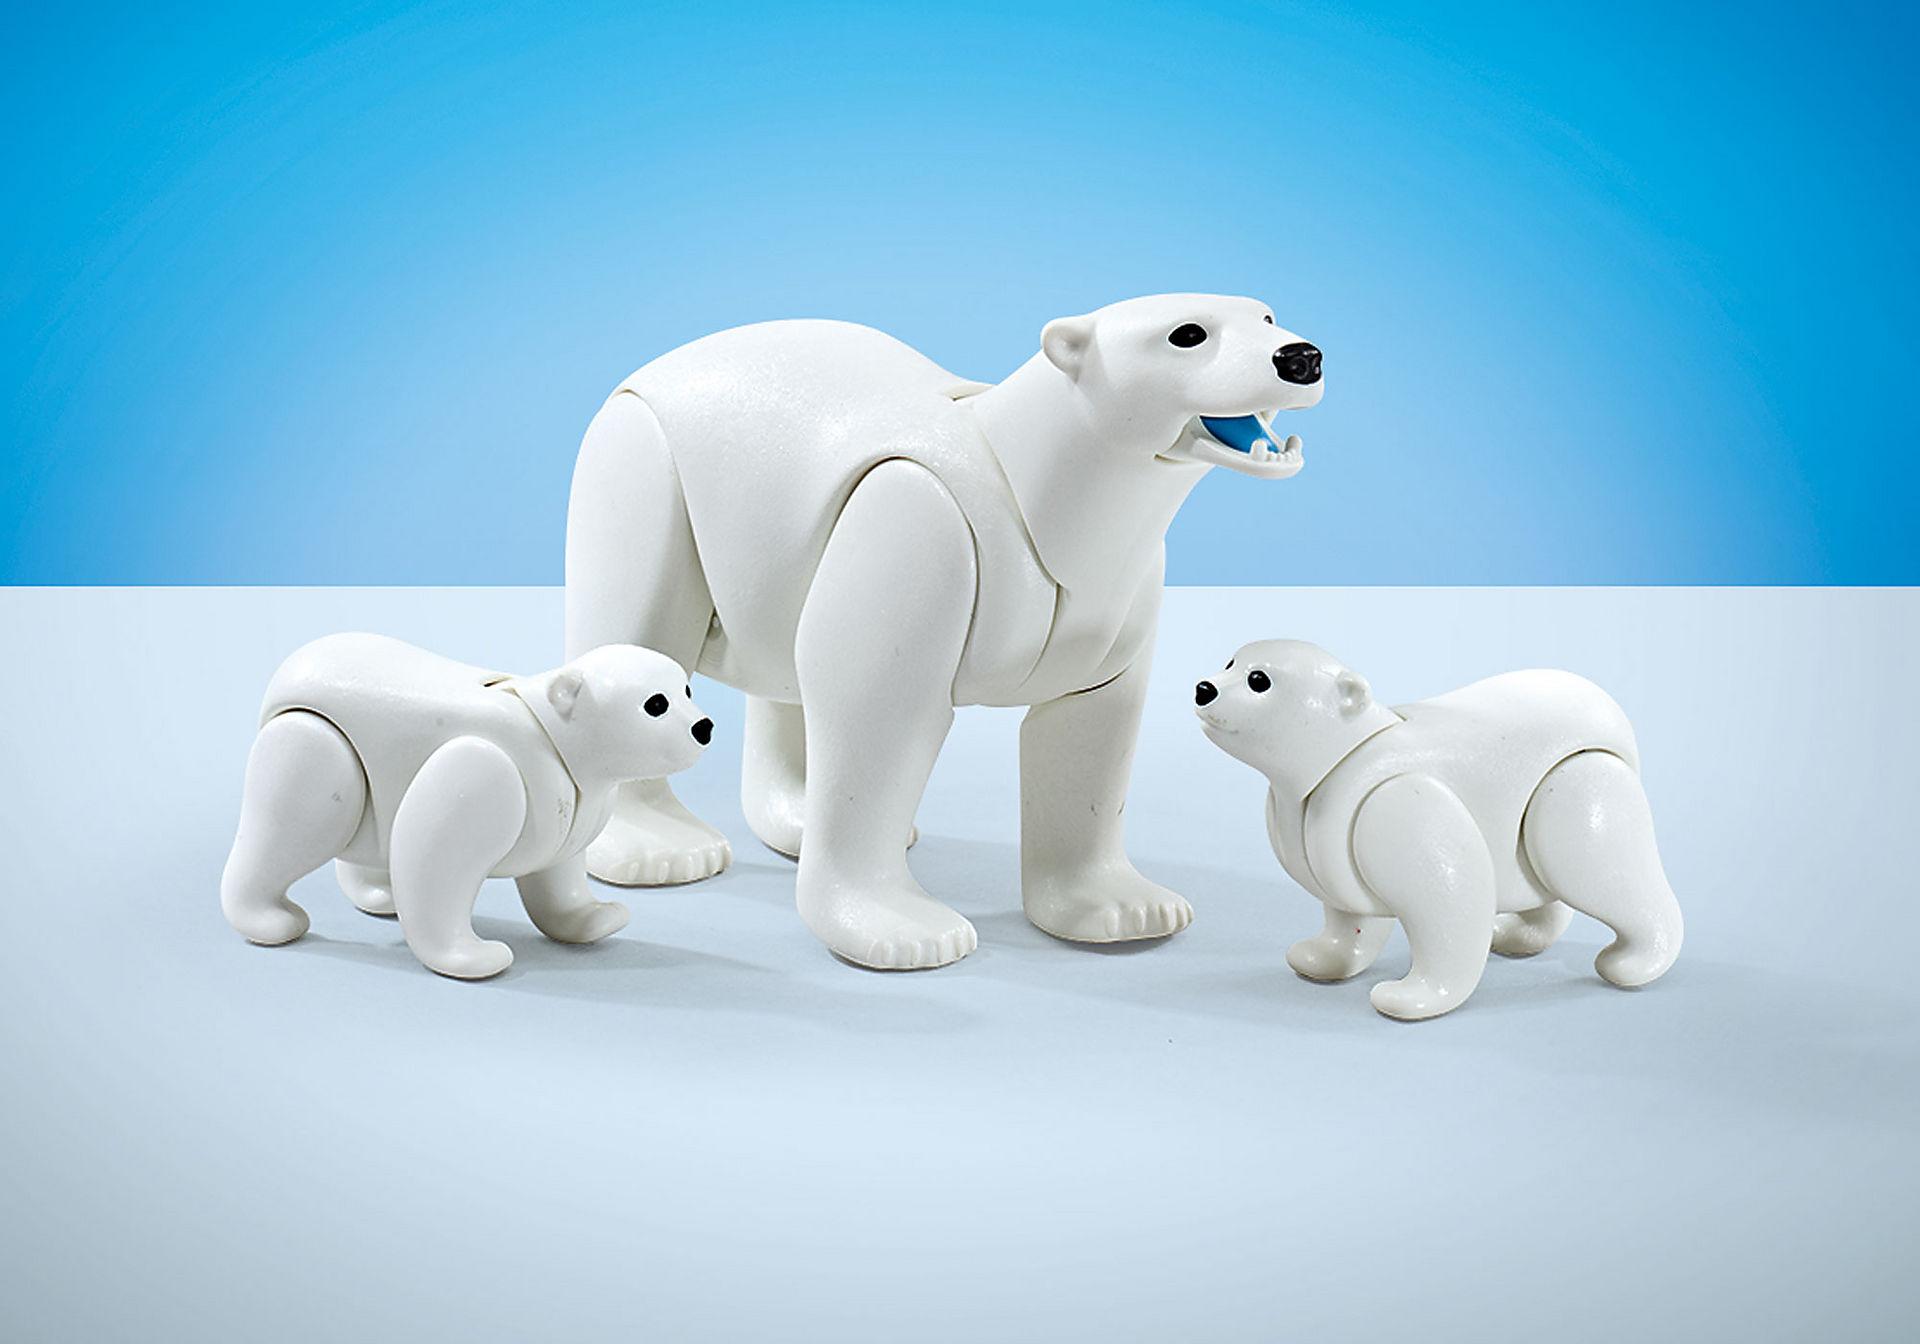 9833 Familia de Osos Polares zoom image1